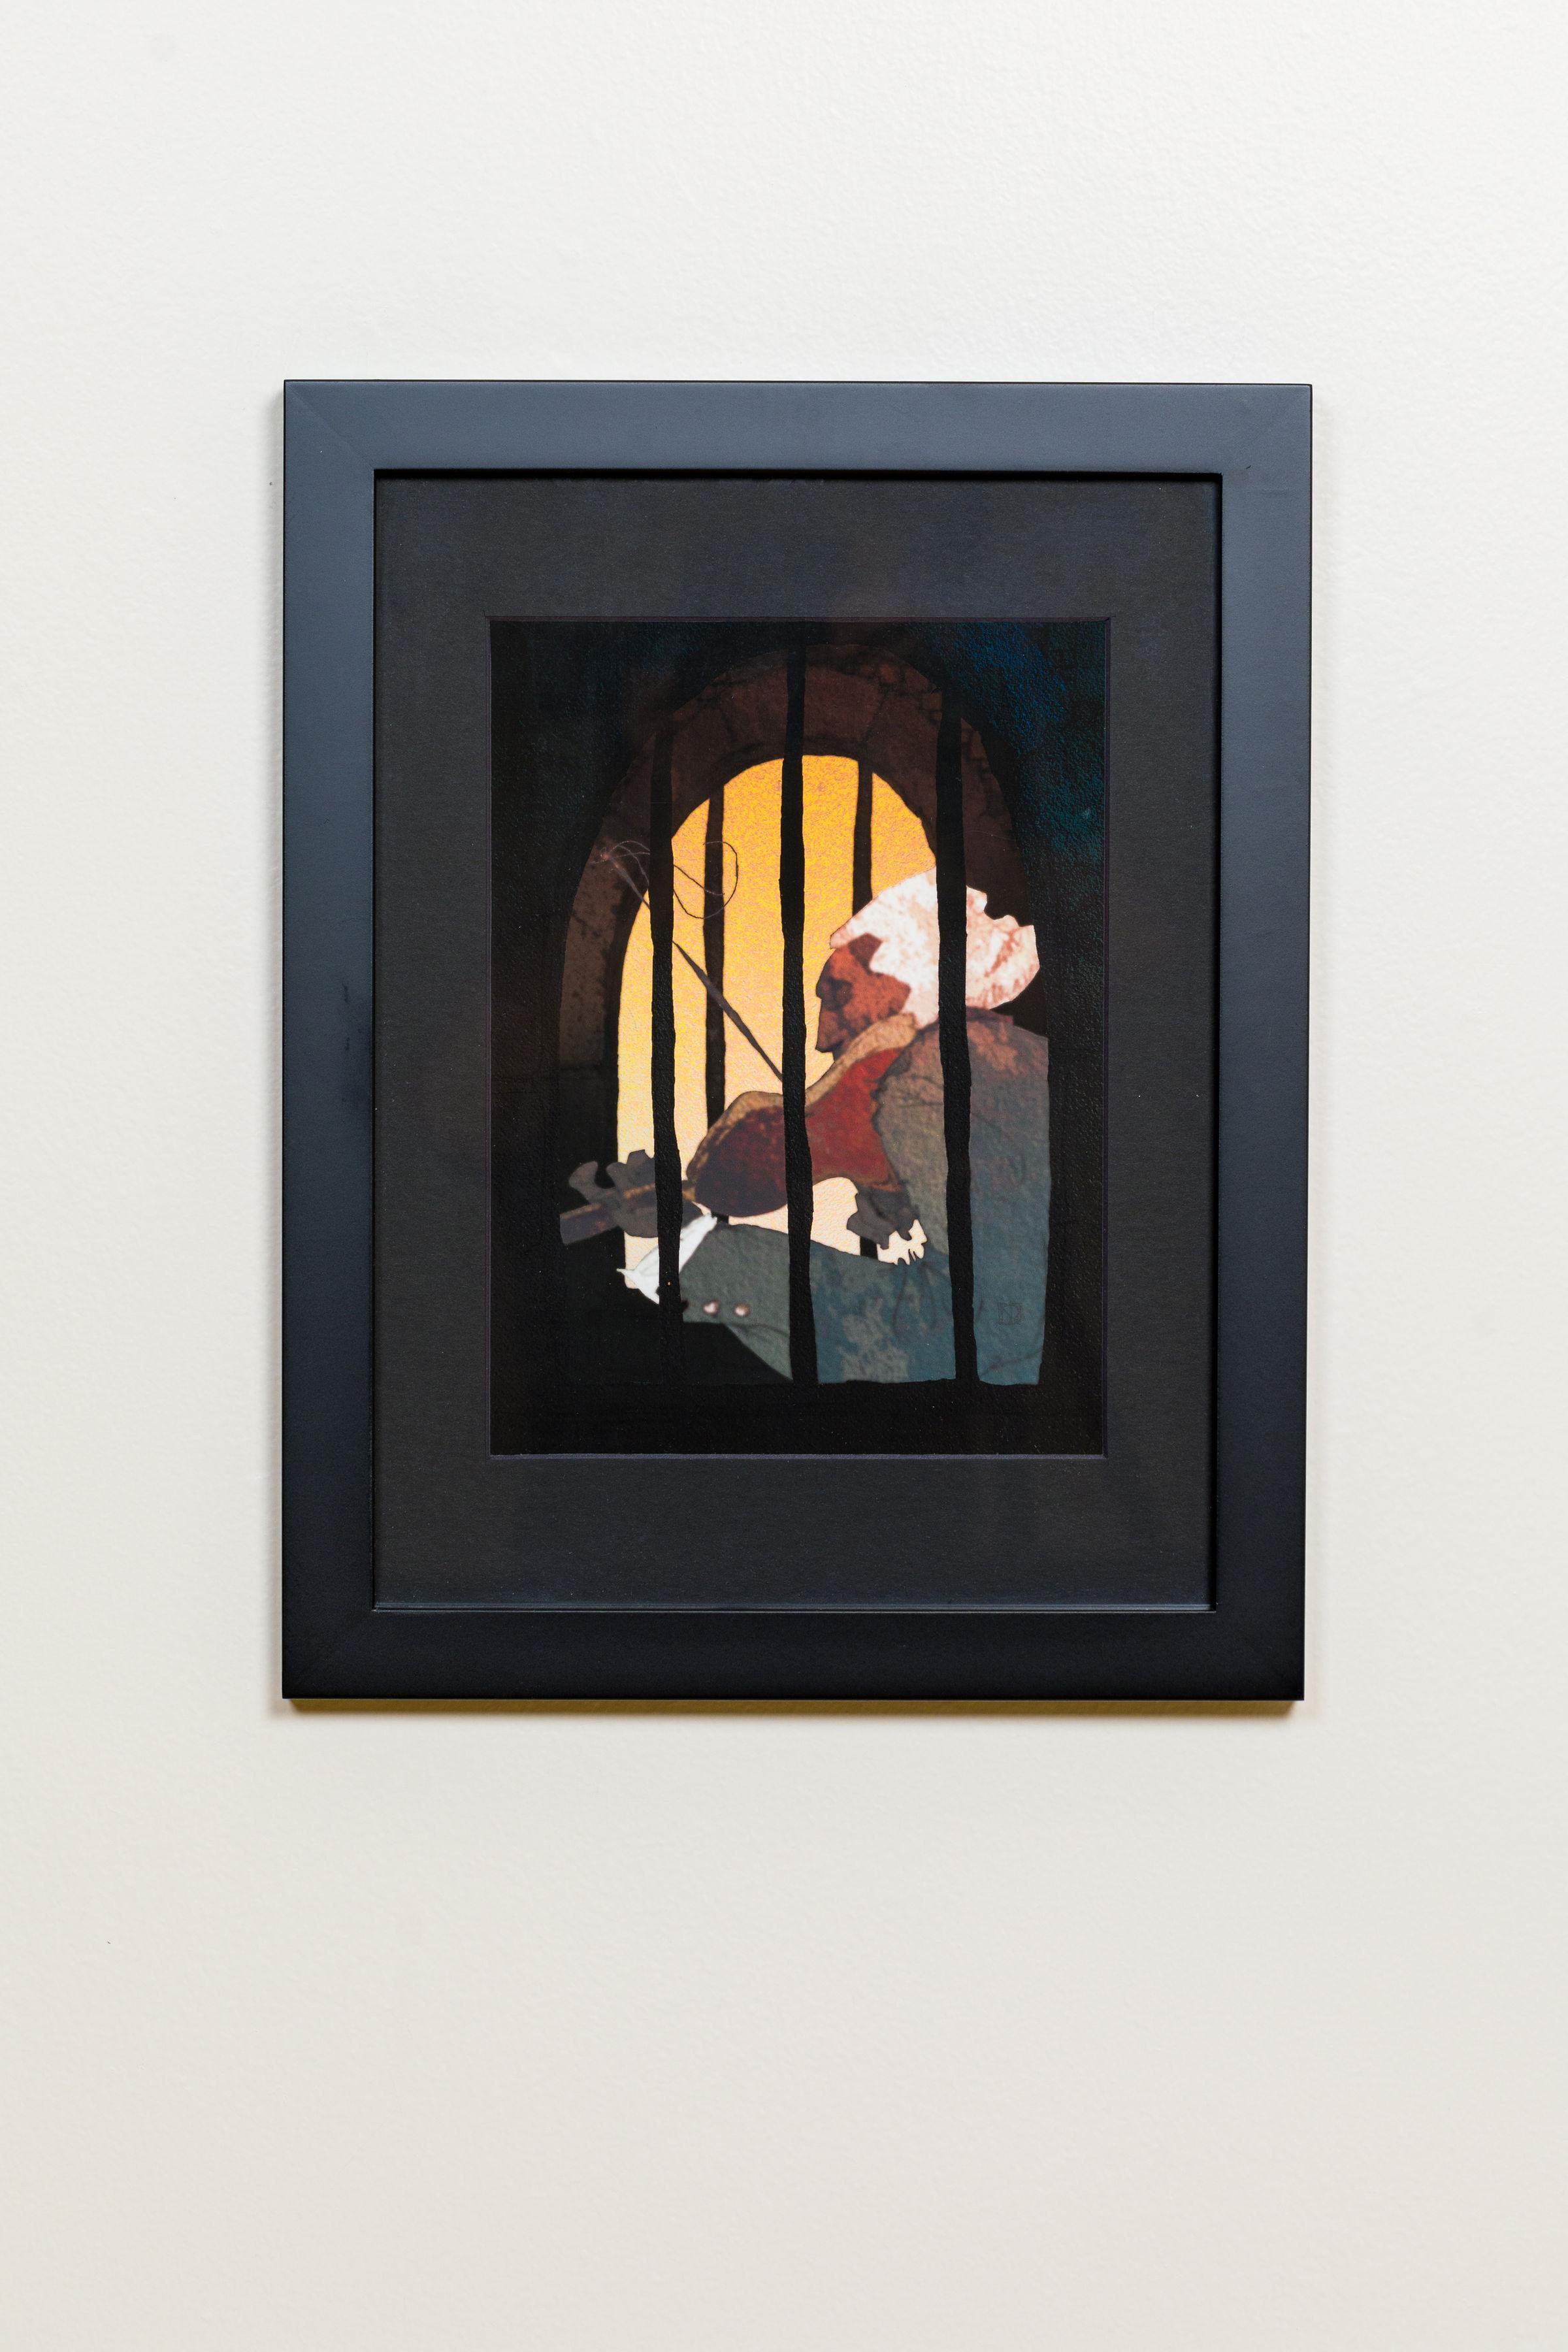 Le Chevalier Imprisoned - Nicholas McNally